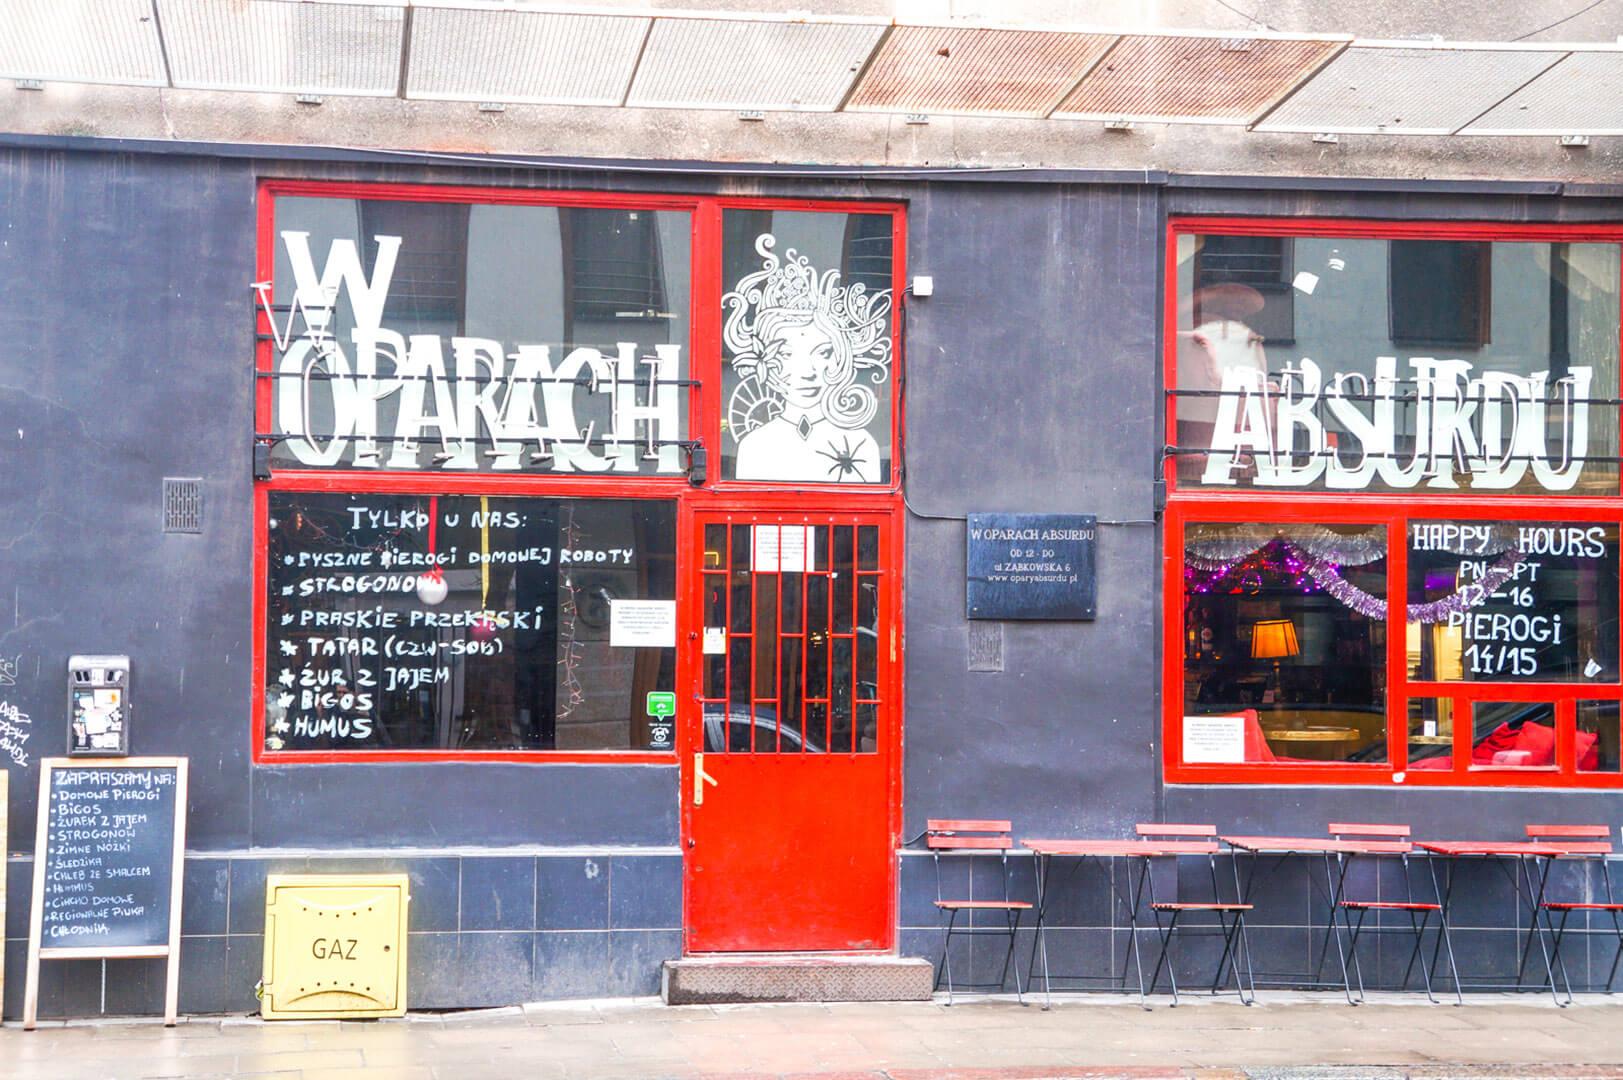 warsaw-poland-guide-la-vie-en-blog-all-rights-reserved-9